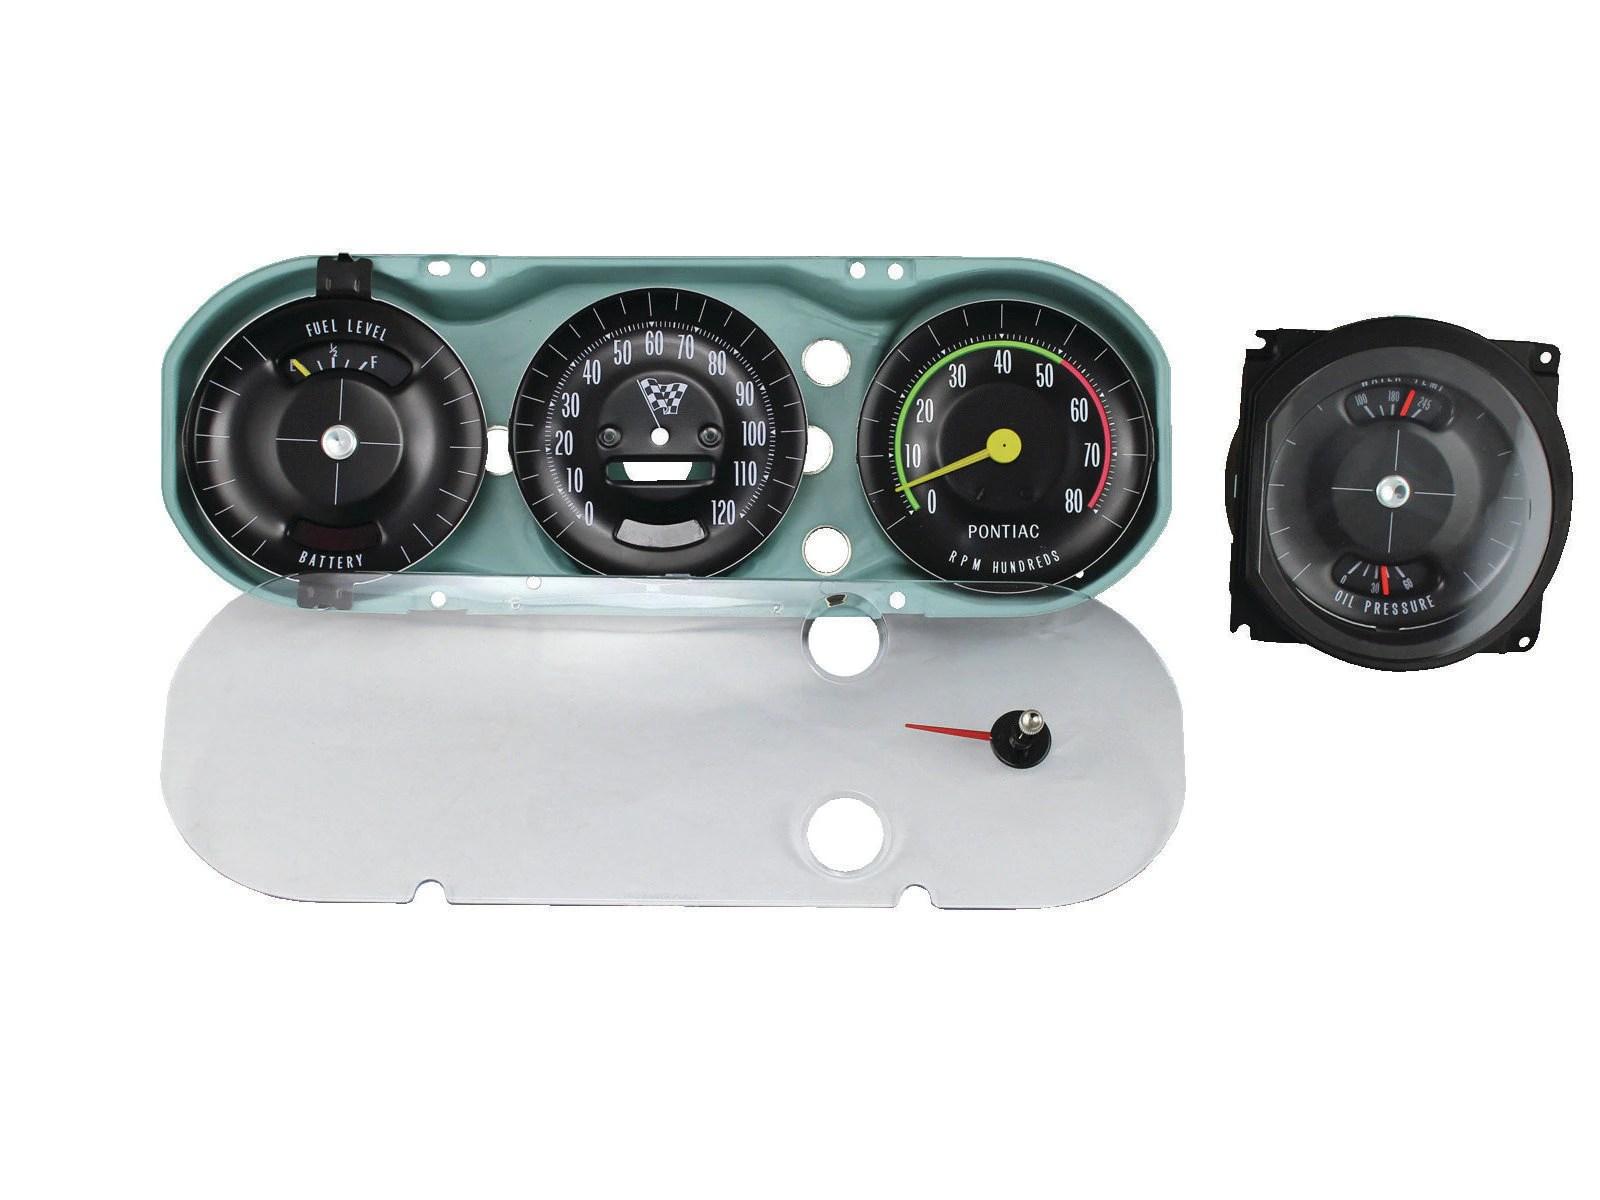 1965 pontiac gto rally gauge wiring diagram wiring library 1965 gto rally gauges wiring diagram [ 1600 x 1200 Pixel ]